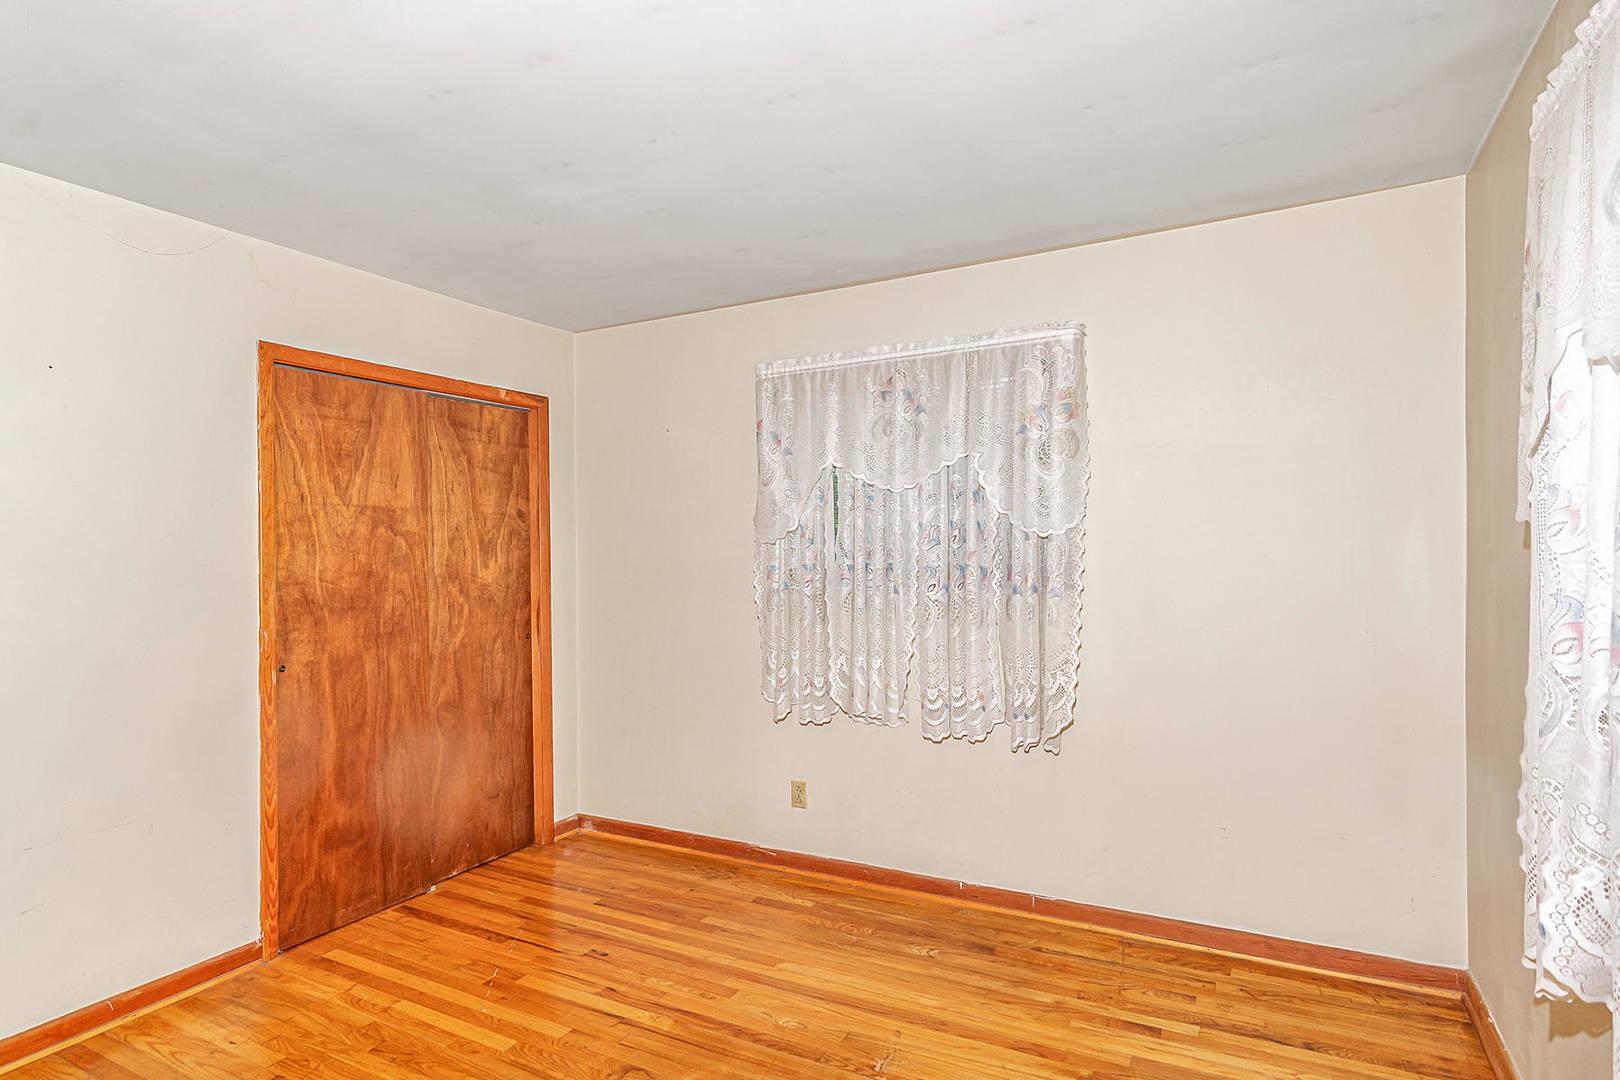 622 N. East St. Ingalls, IN 46048